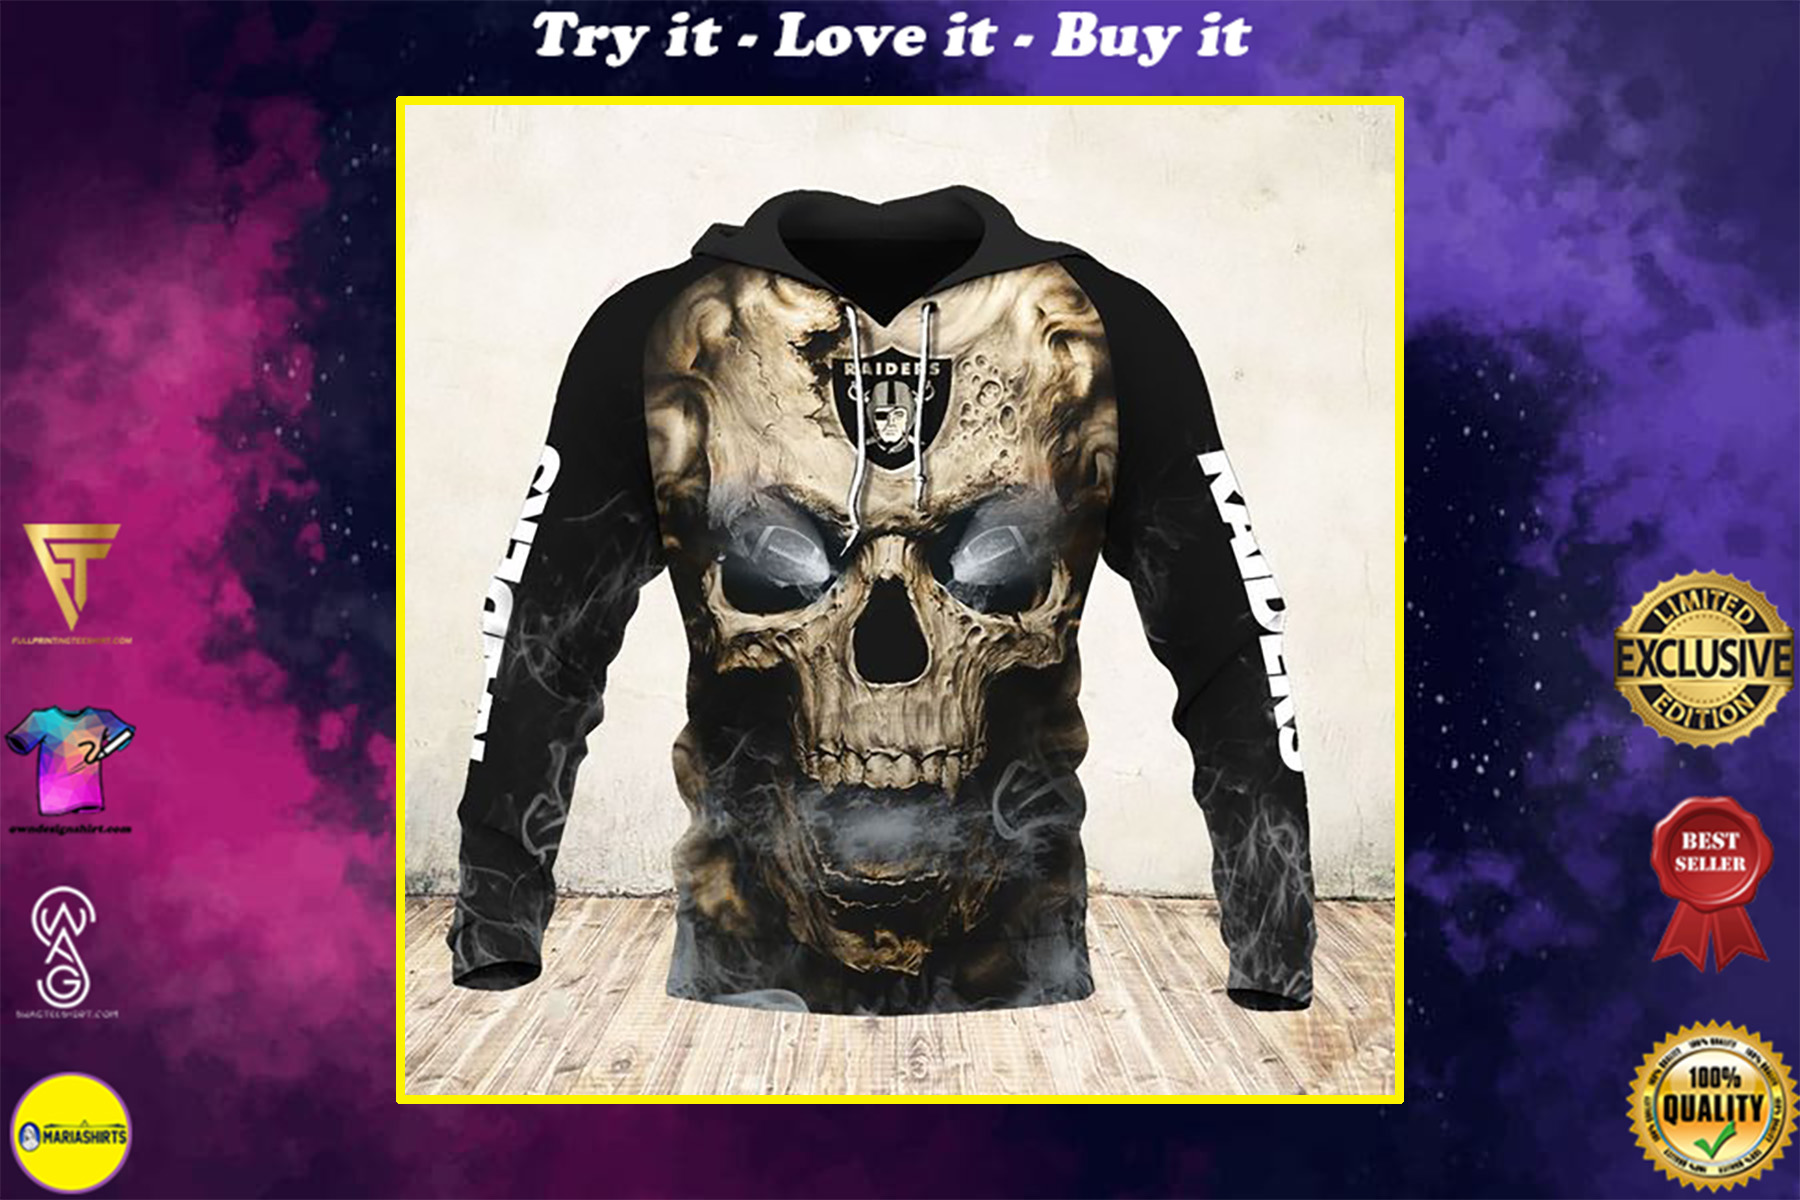 skull and las vegas raiders football team full over printed shirt